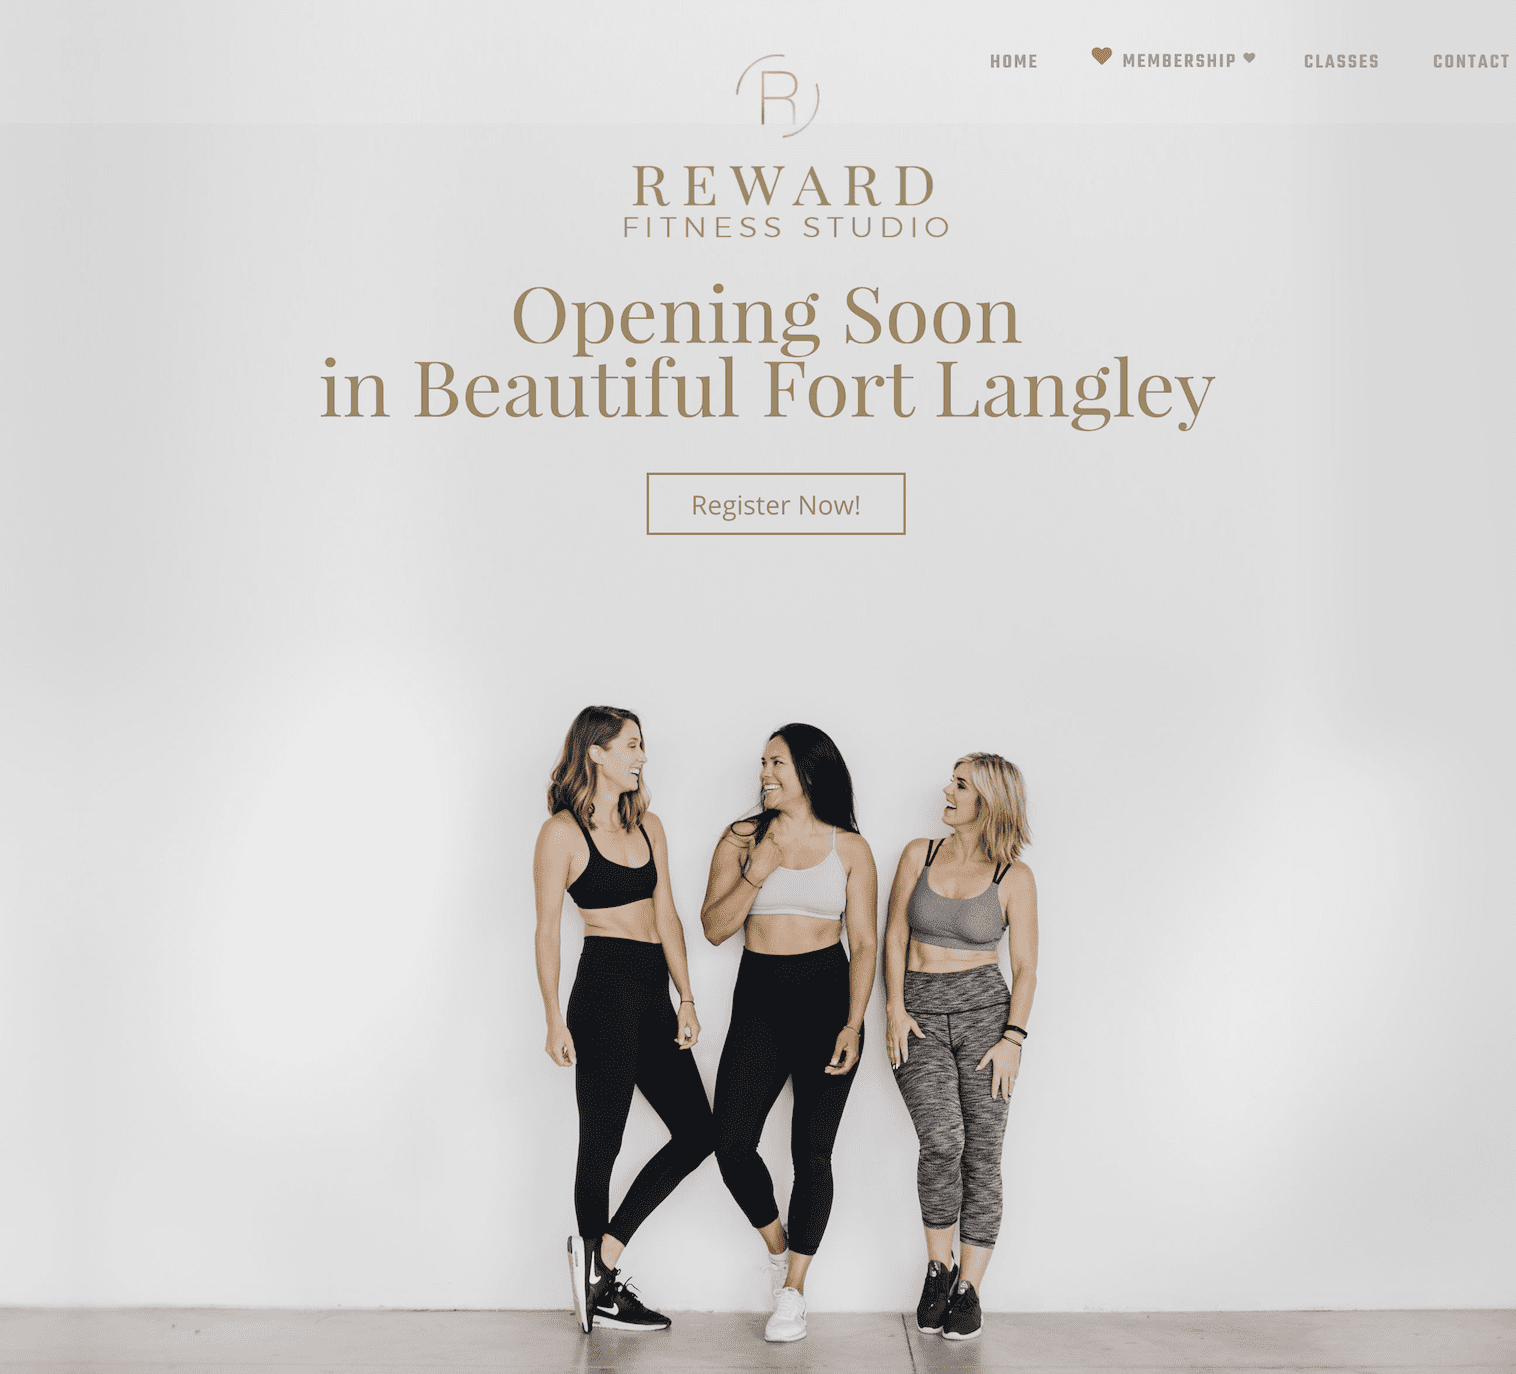 Reward-Fitness-Studio-Designed-by-Oliver-Spence-Creative-4